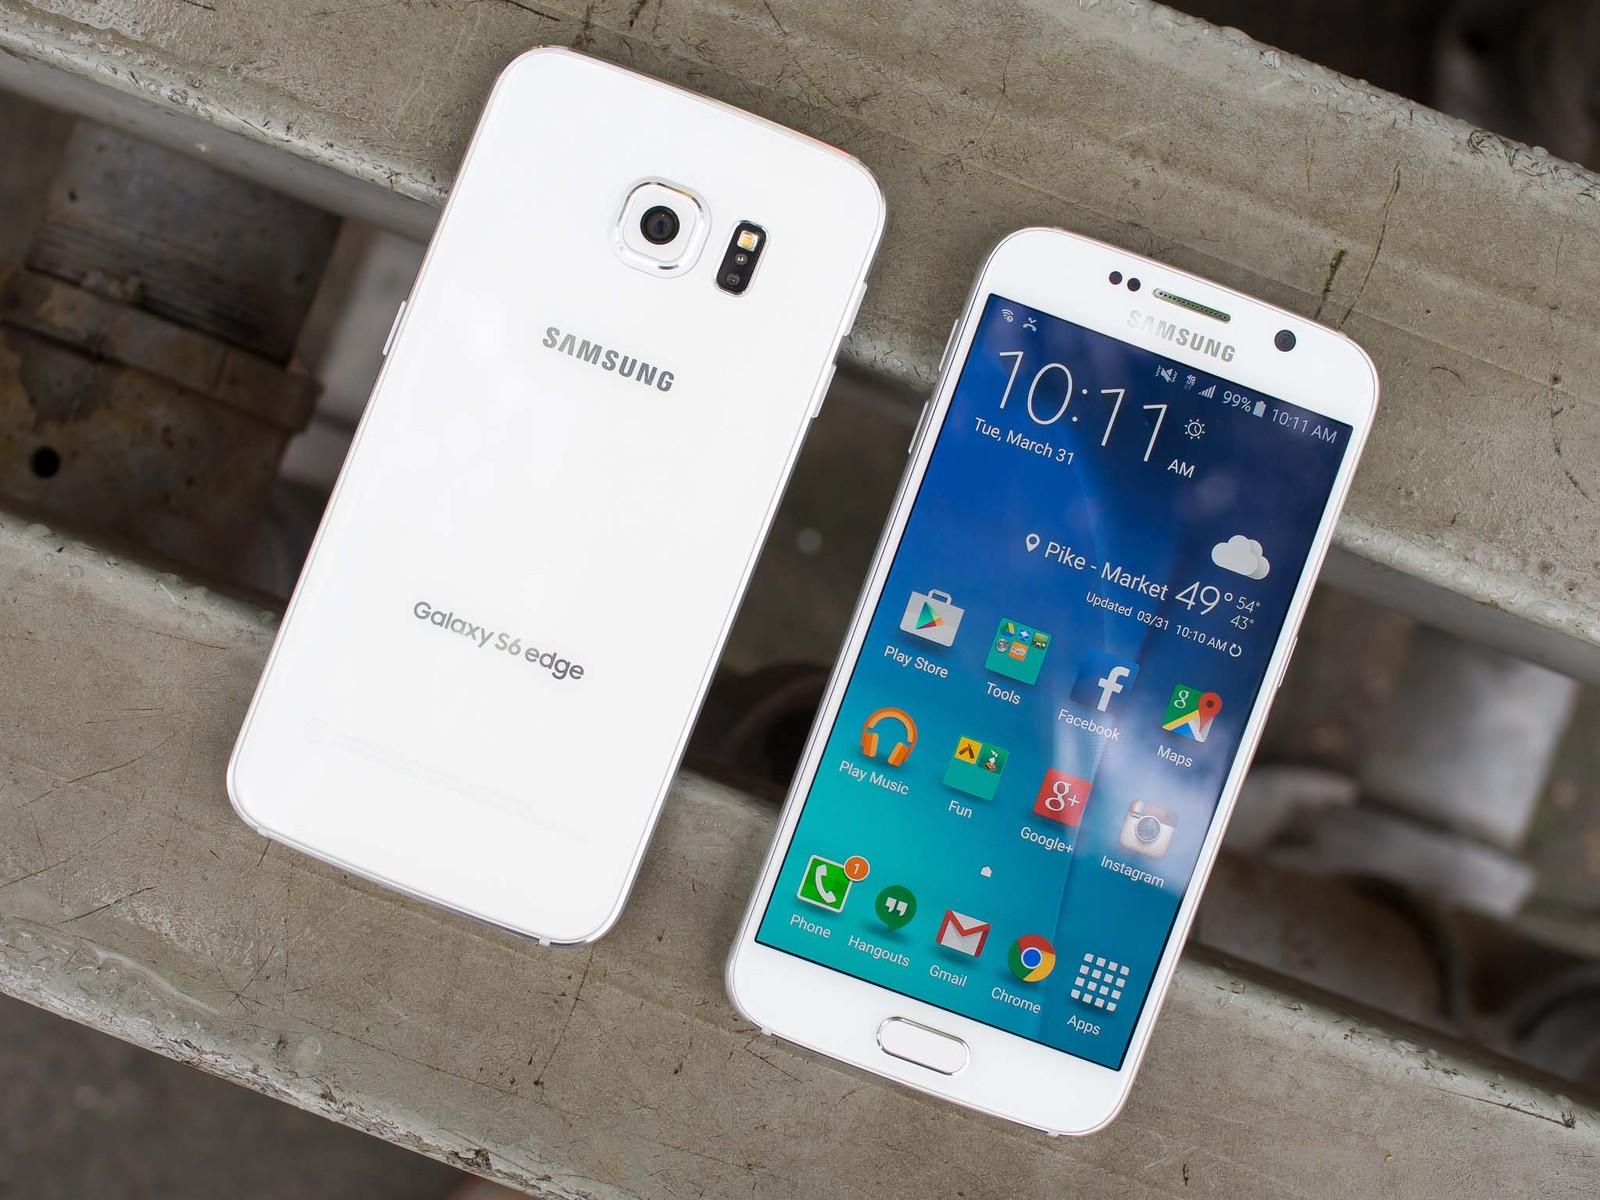 Harga HP Samsung Galaxy S6 Edge Plus Spesifikasi RAM 4 GB